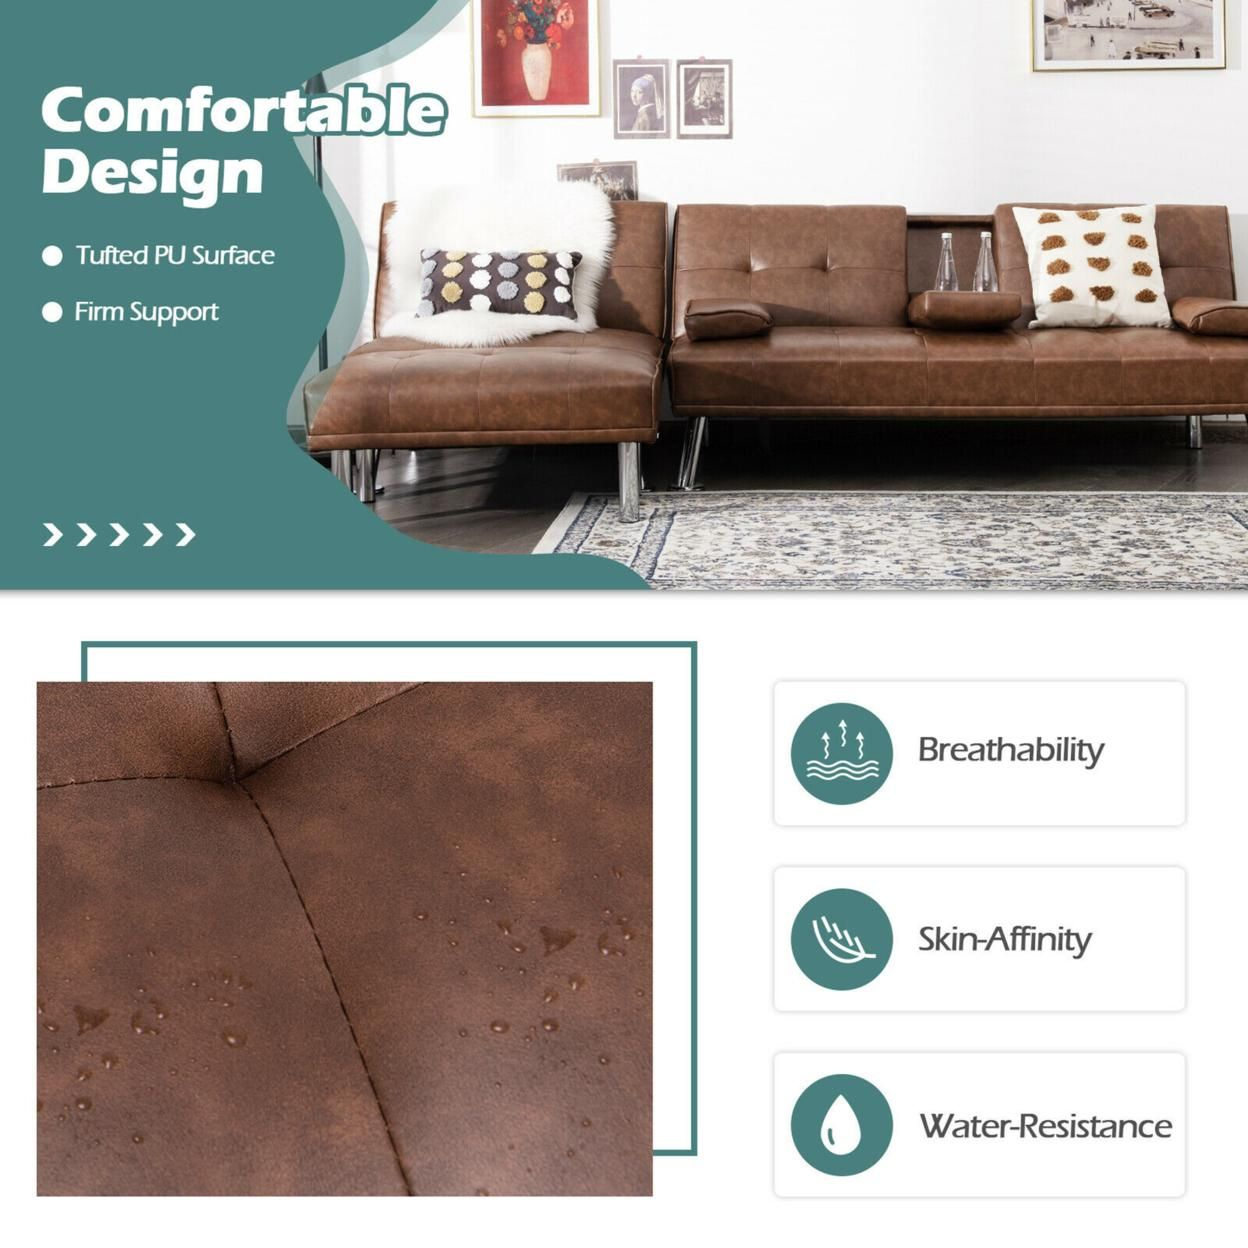 Gymax 3-Piece Sectional Sofa Set Convertible Futon w/Single Sofa & Ottoman Brown